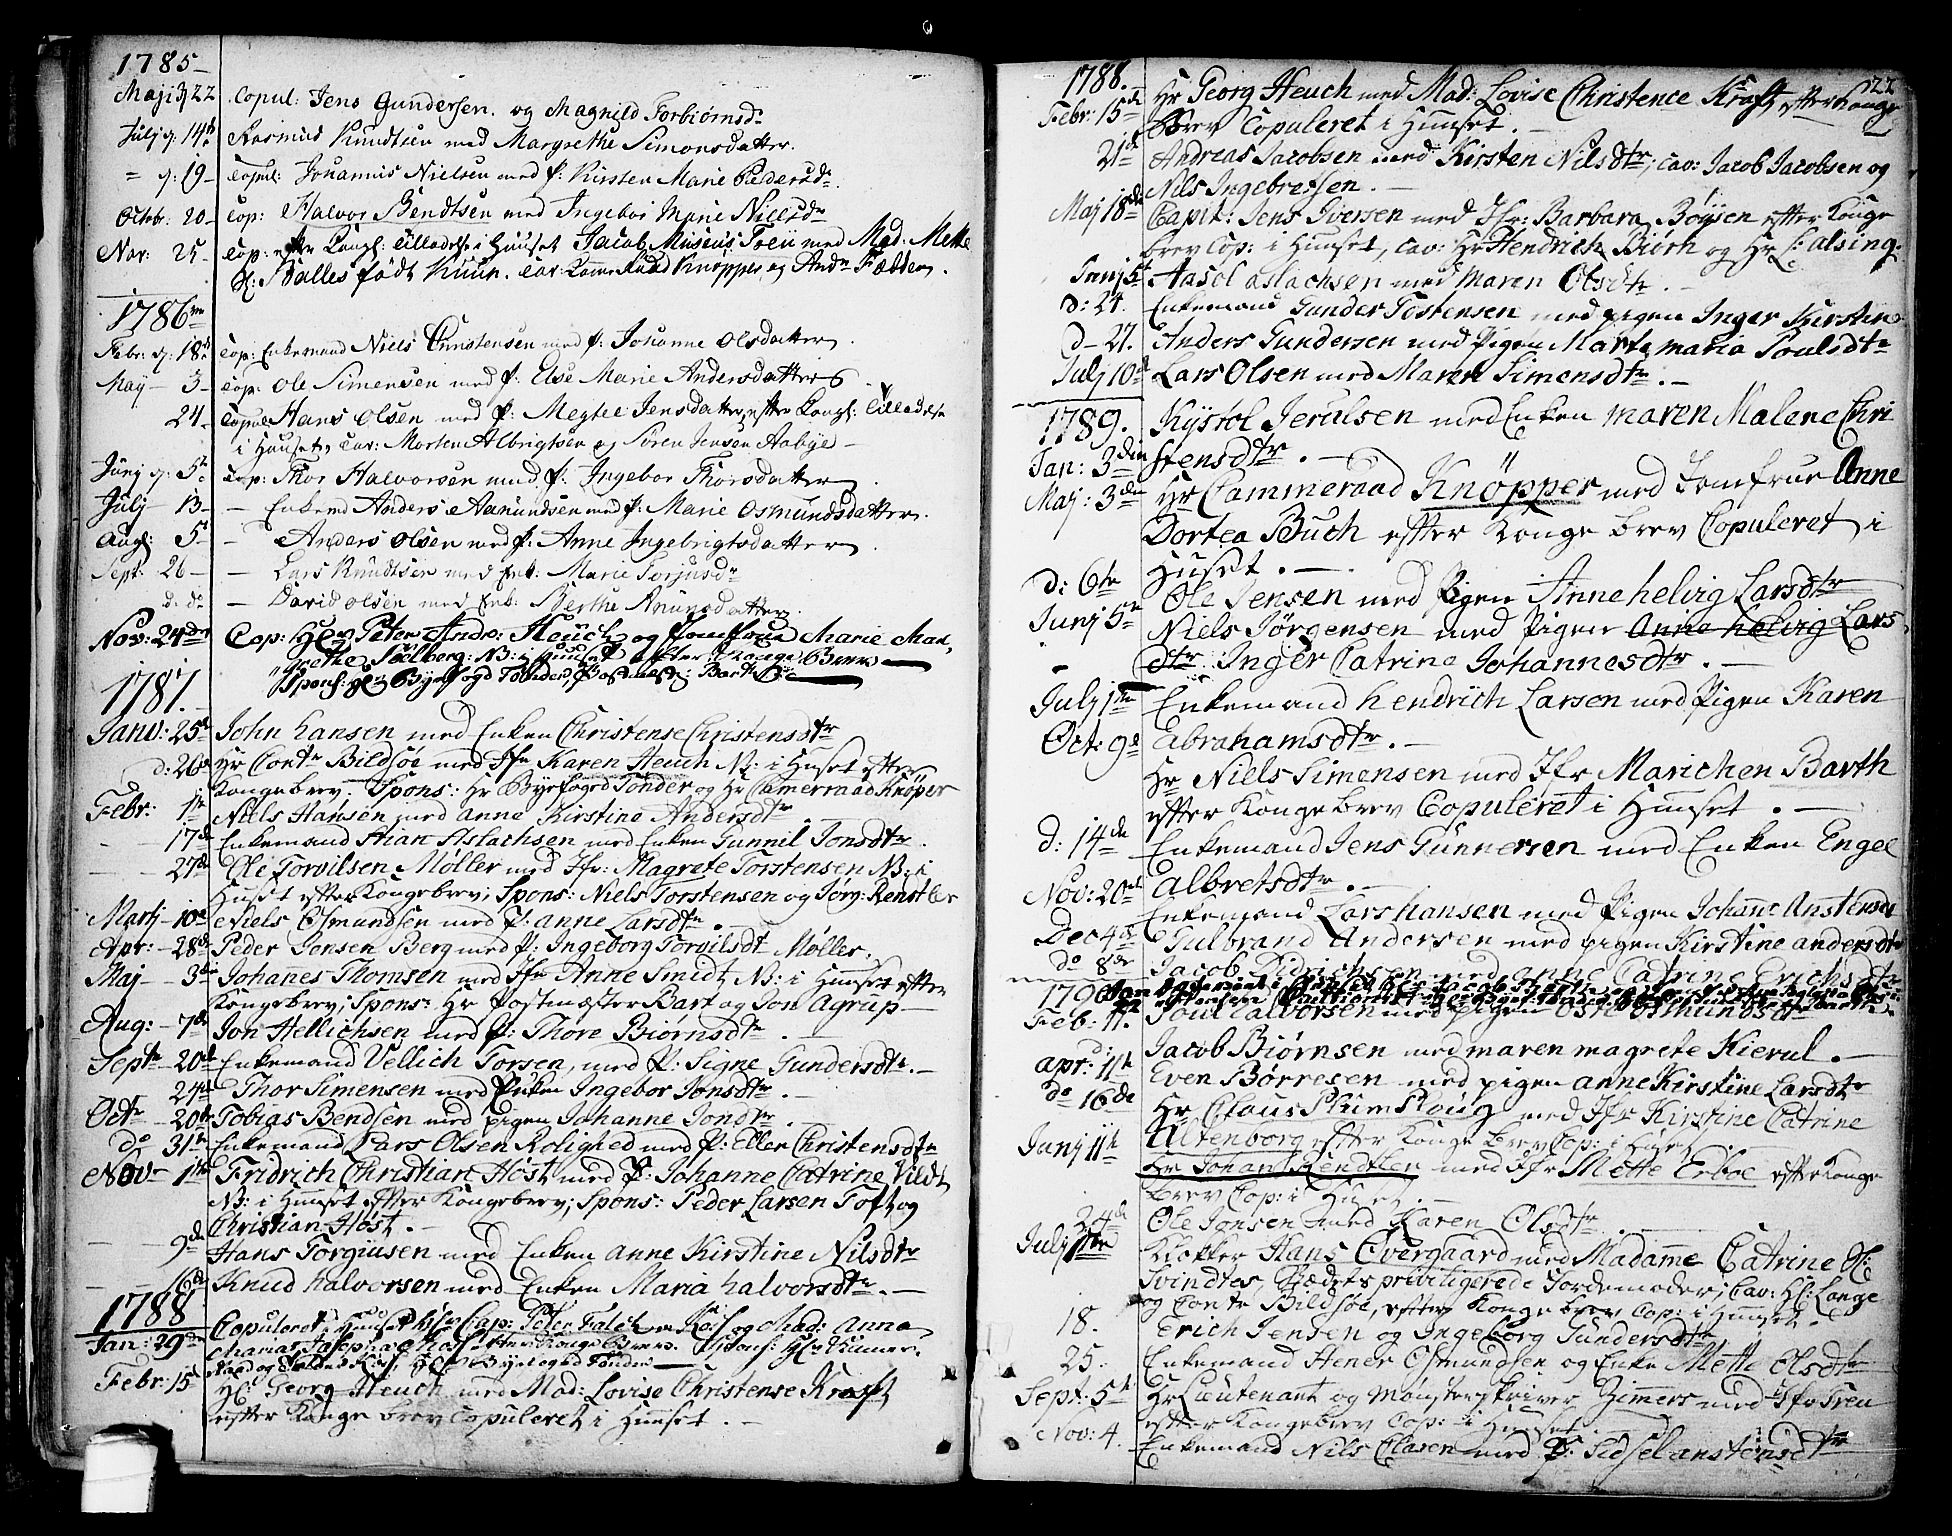 SAKO, Kragerø kirkebøker, F/Fa/L0002: Ministerialbok nr. 2, 1767-1802, s. 22